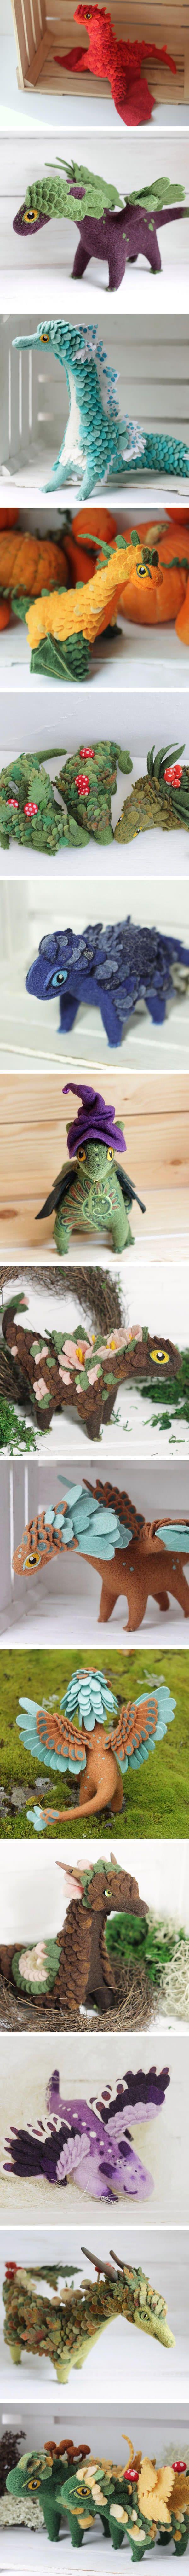 These felt dragons are wonderfully made. (By Alena Bobrova)